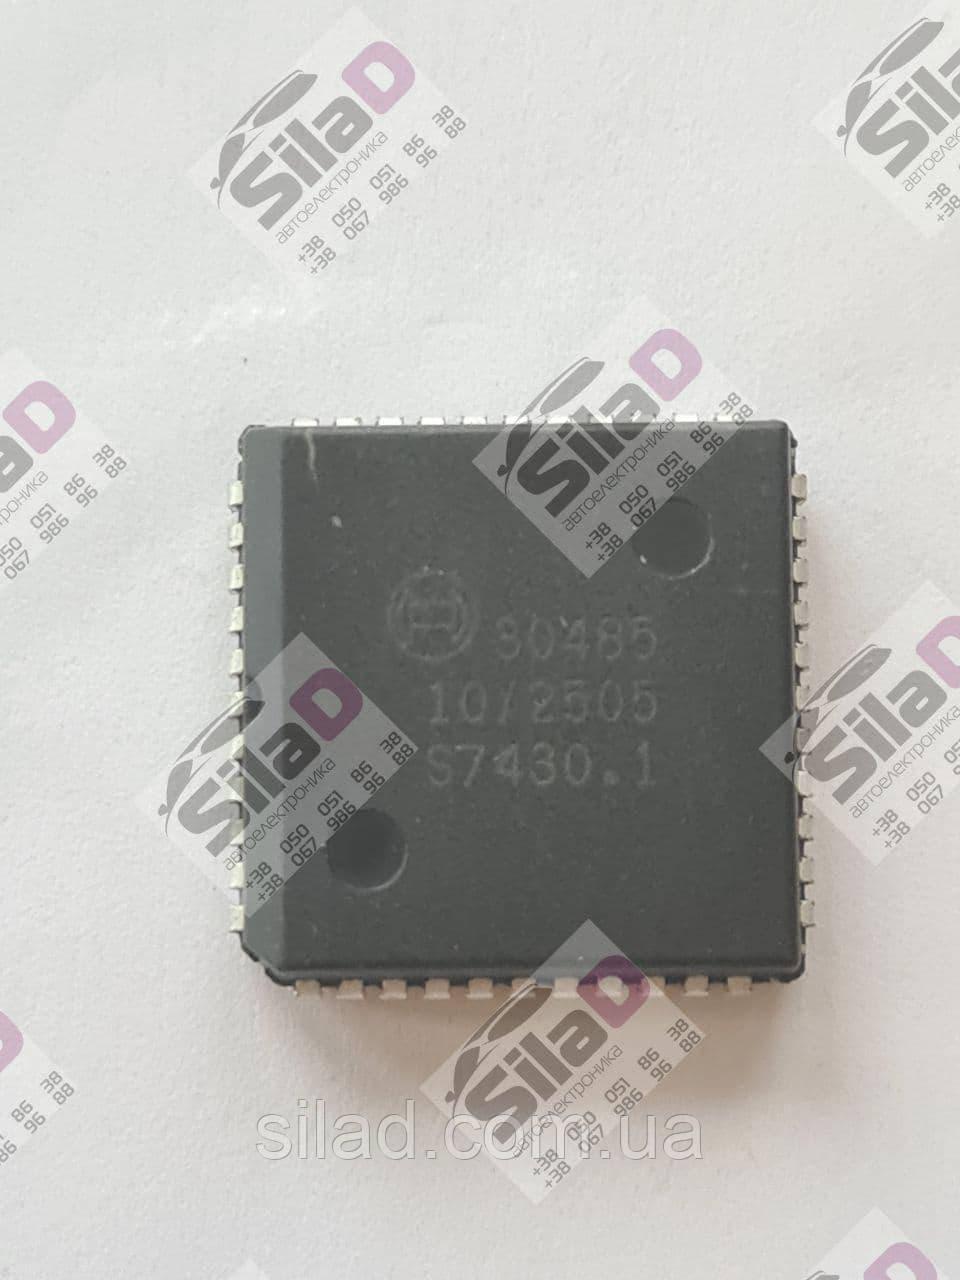 Микросхема Bosch 30485 корпус PLCC44